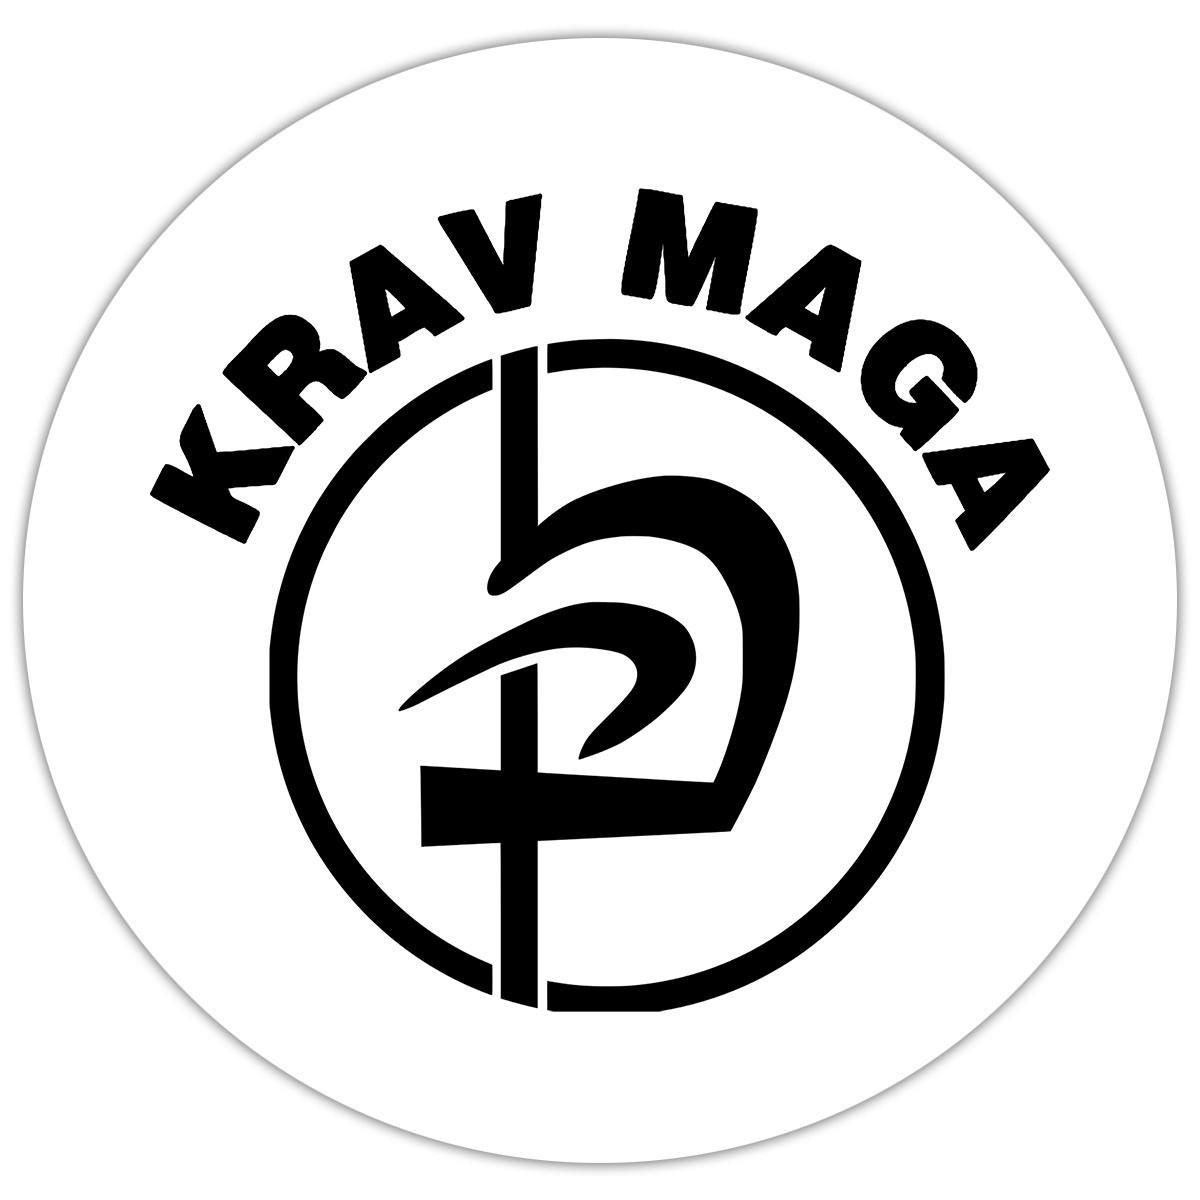 Krav Maga : Gift Sticker Martial Arts Israeli Self Defense